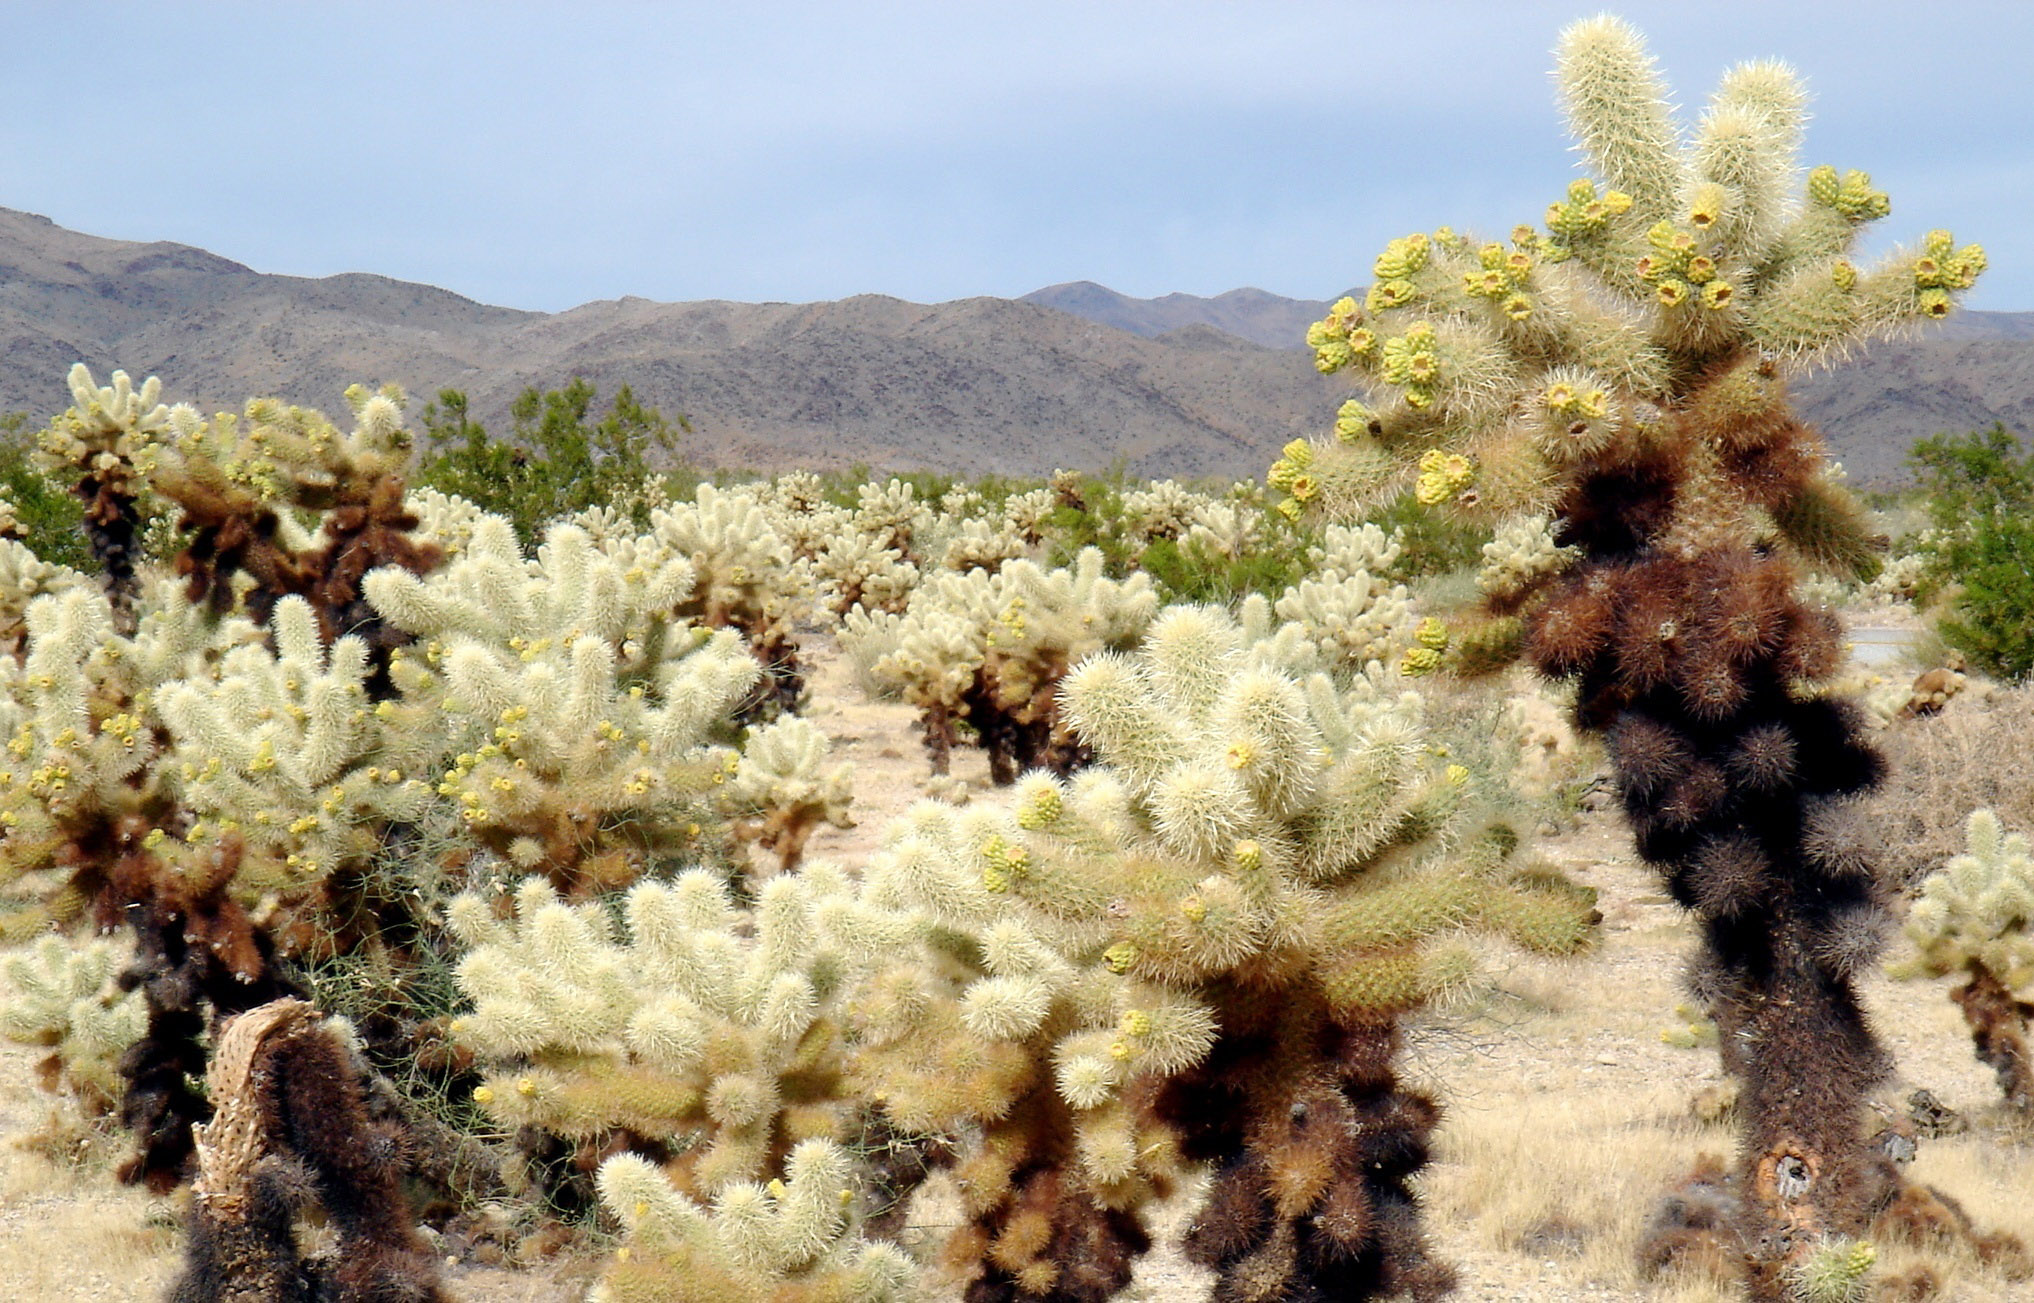 Cholla cactus garden in joshua tree national park - Cholla cactus garden joshua tree ...